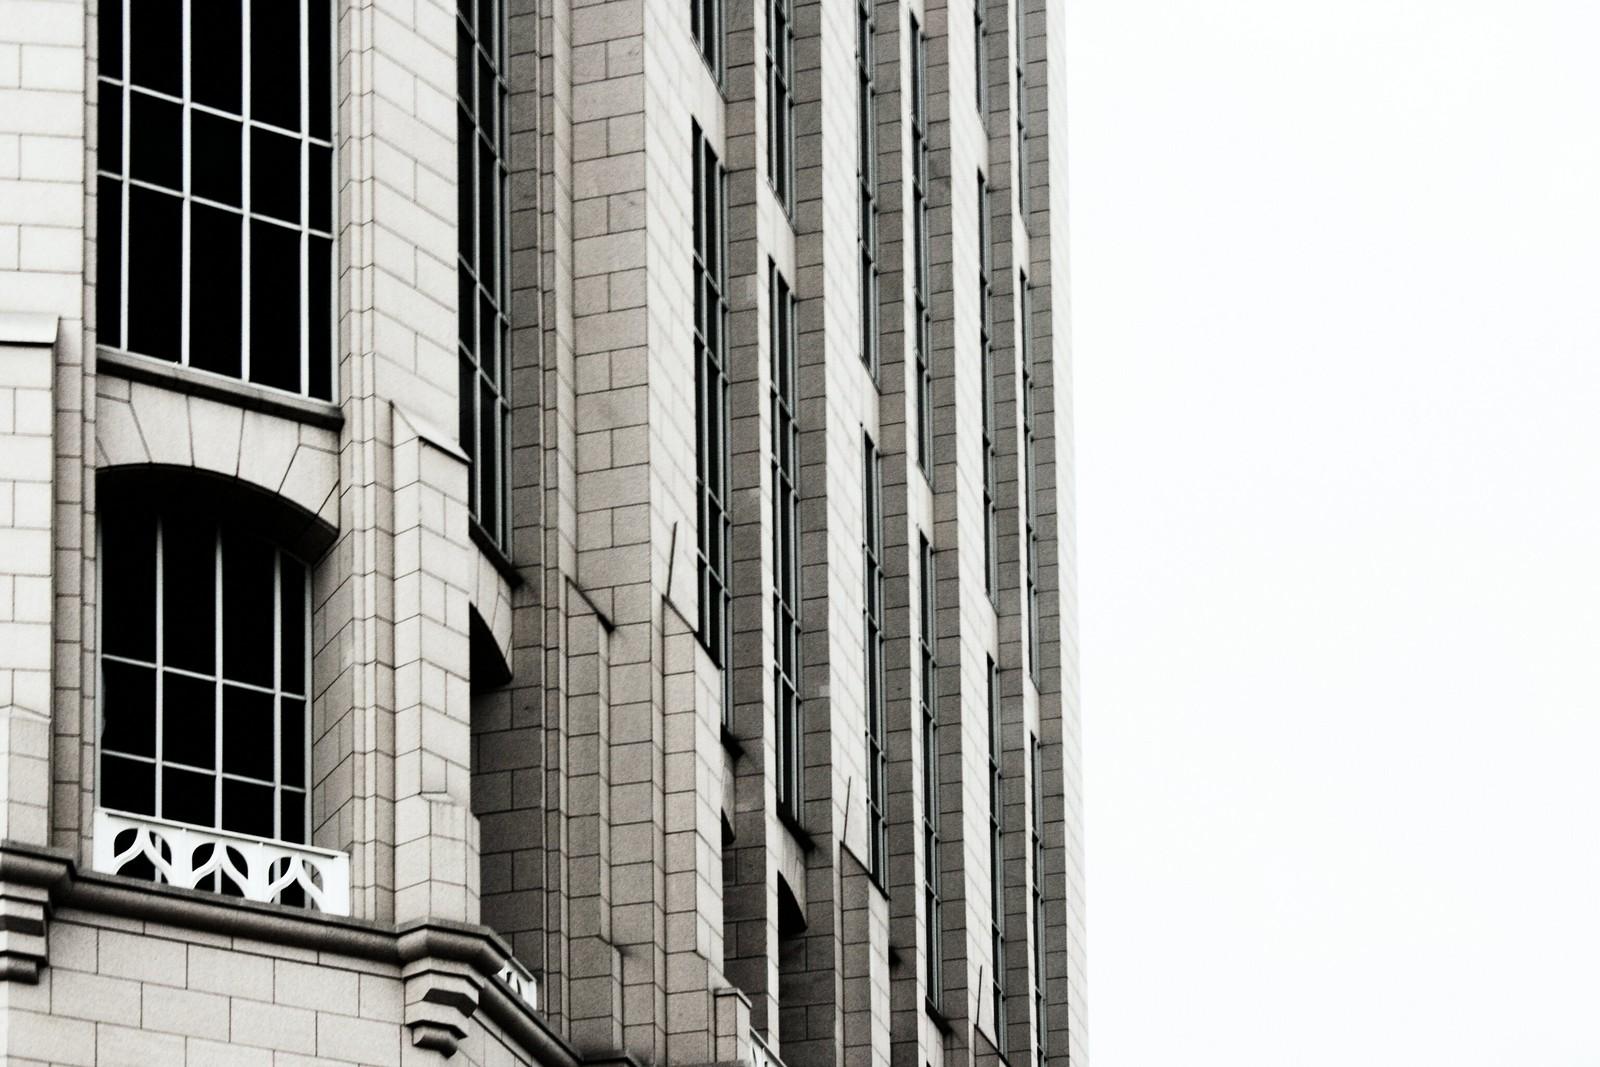 One Atlantic Center, 14th Street, Midtown Atlanta, Nov 2014